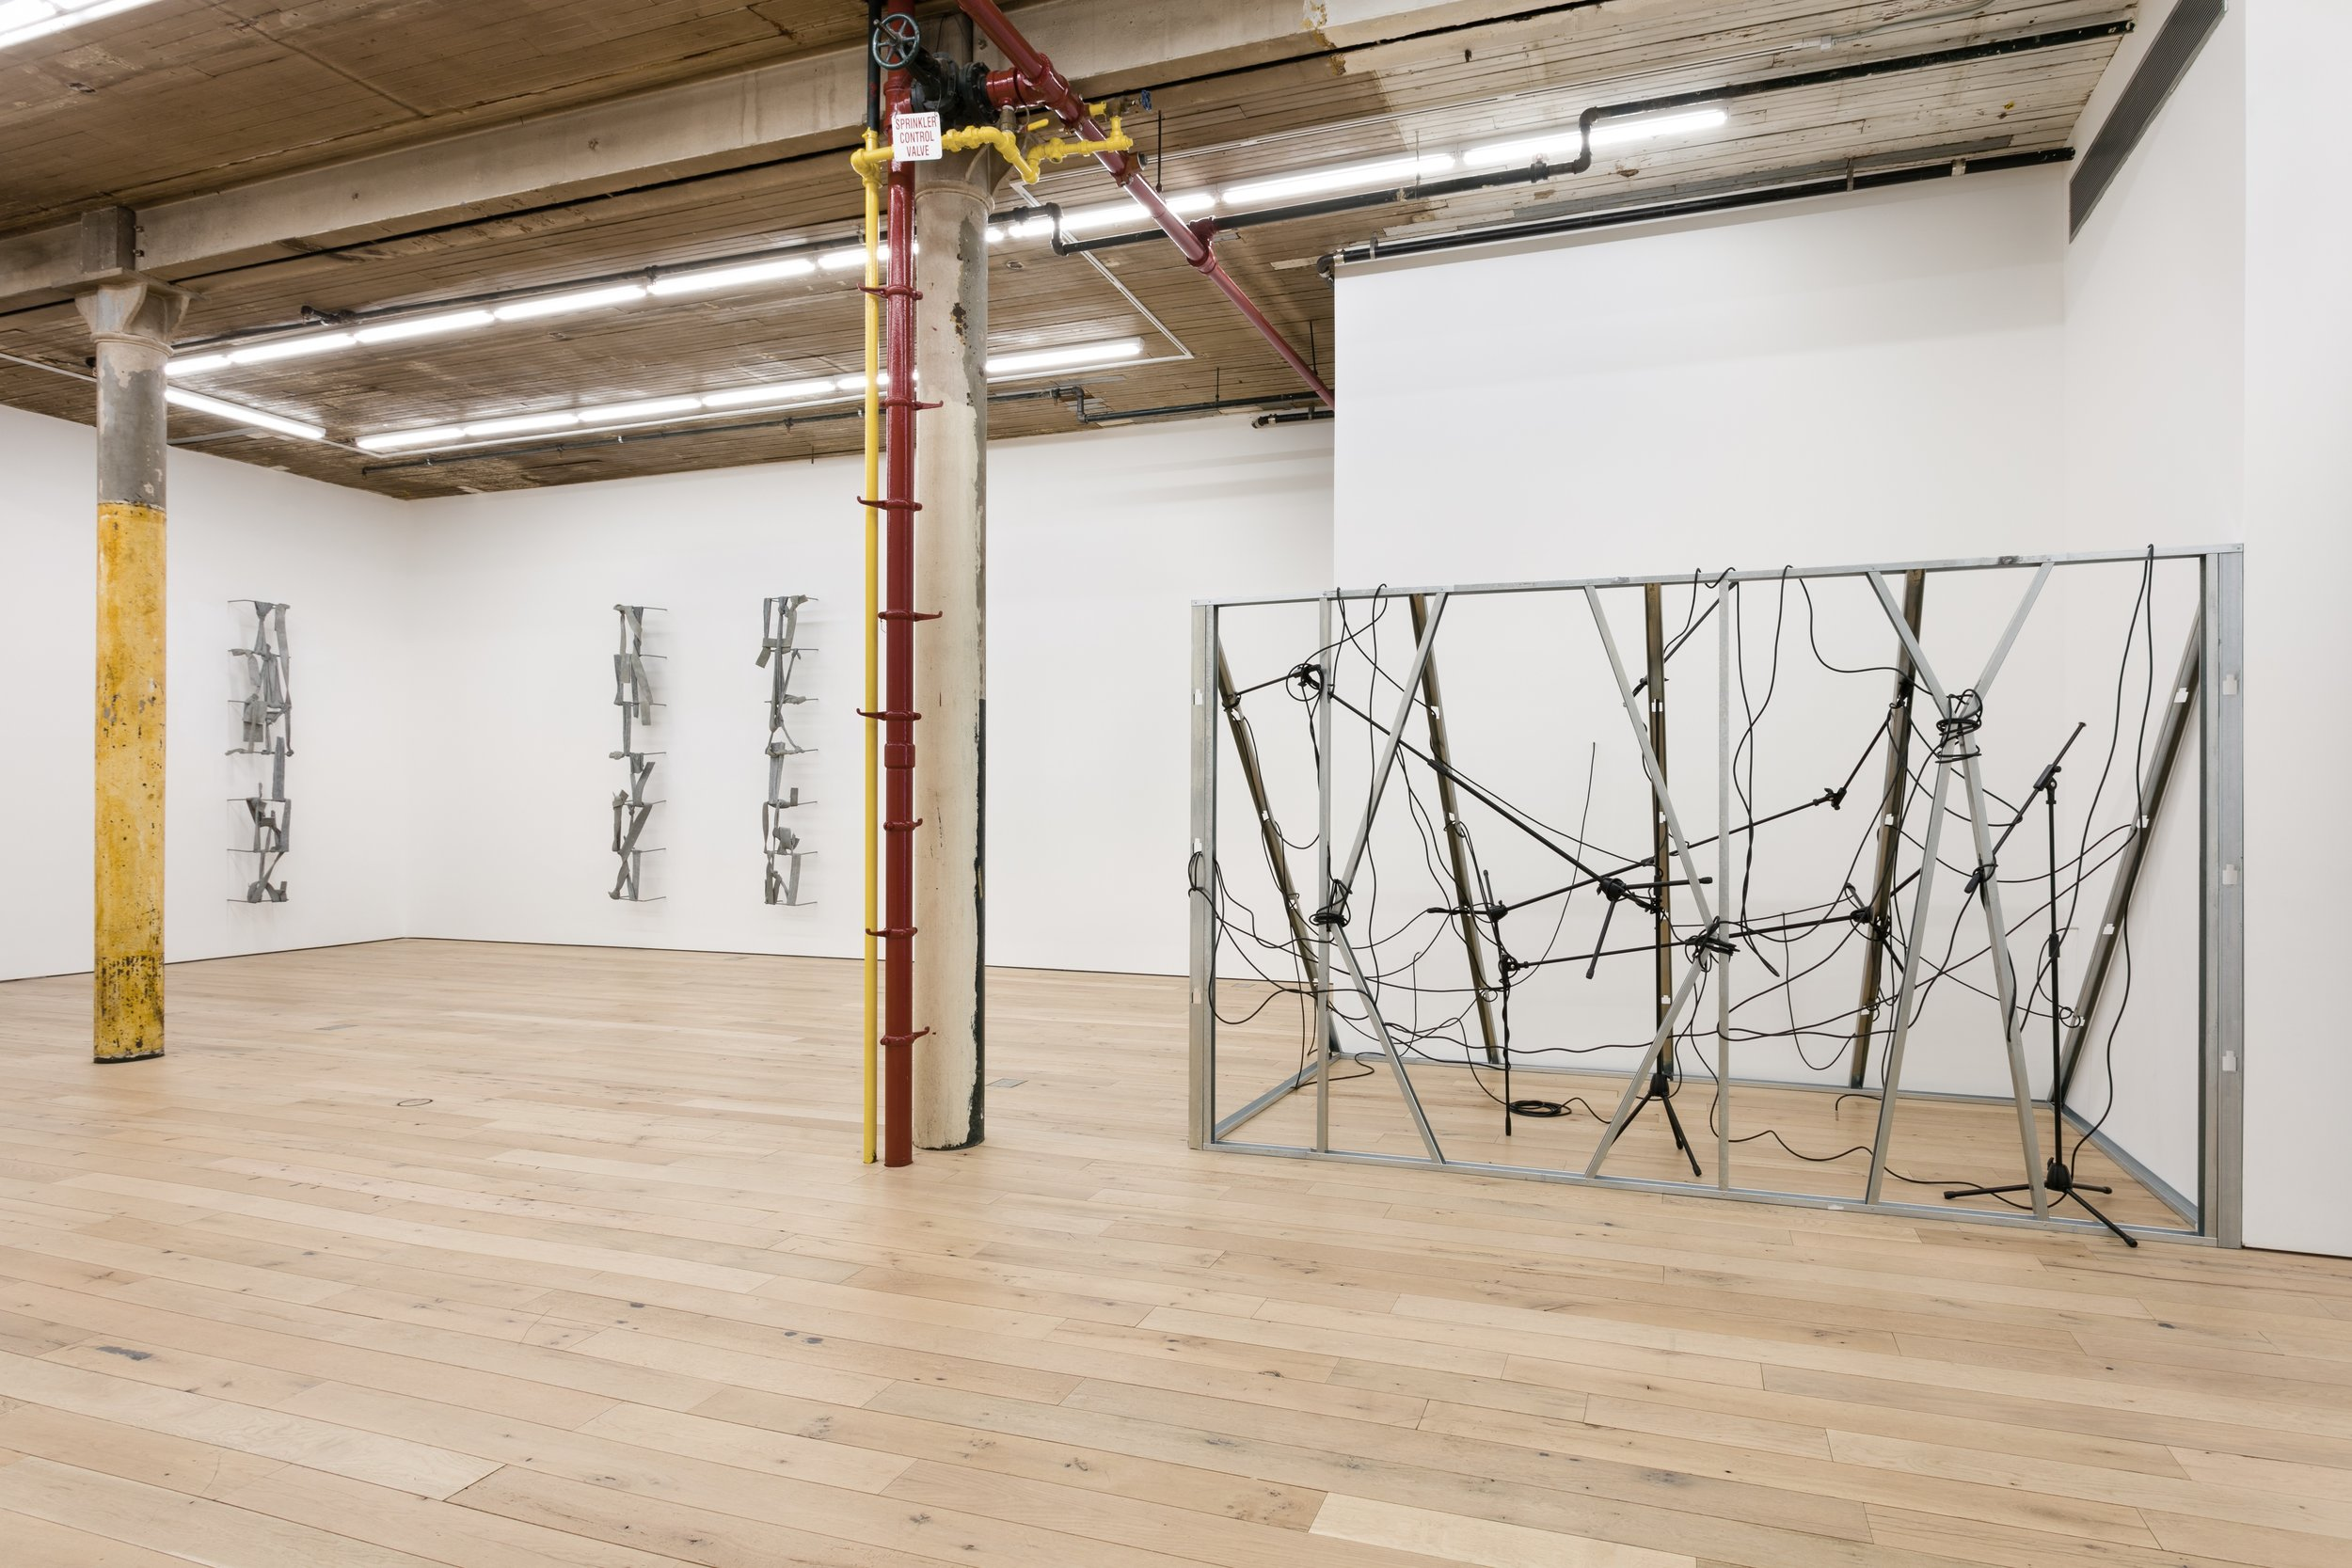 Fall Apart, Martos Gallery, 2019, Installation View 4